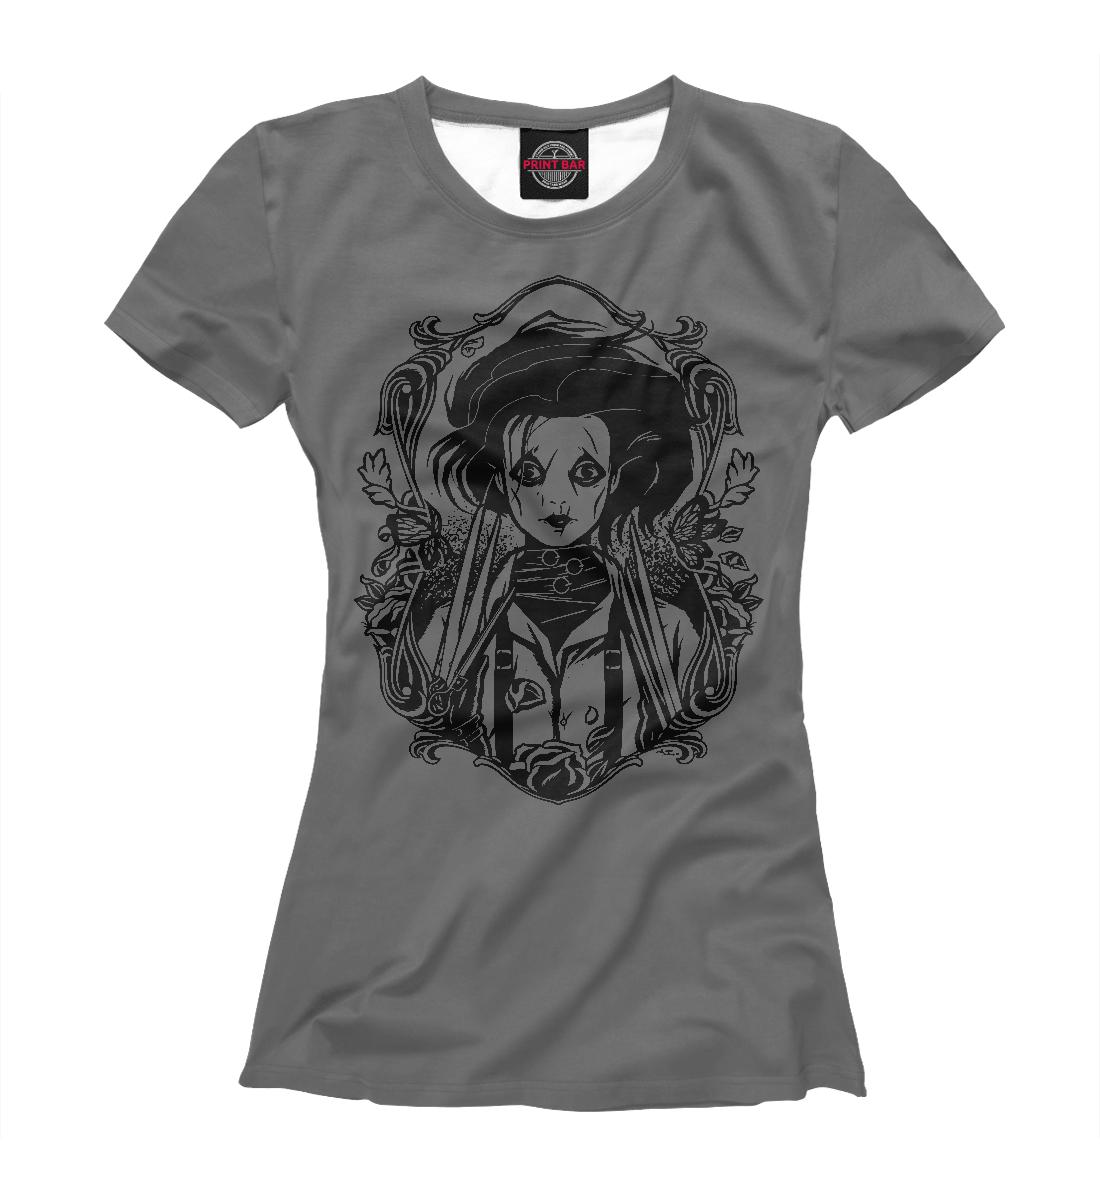 «Эдвард руки-ножницы» — футболка женская, артикул: TIM-787567-fut-1